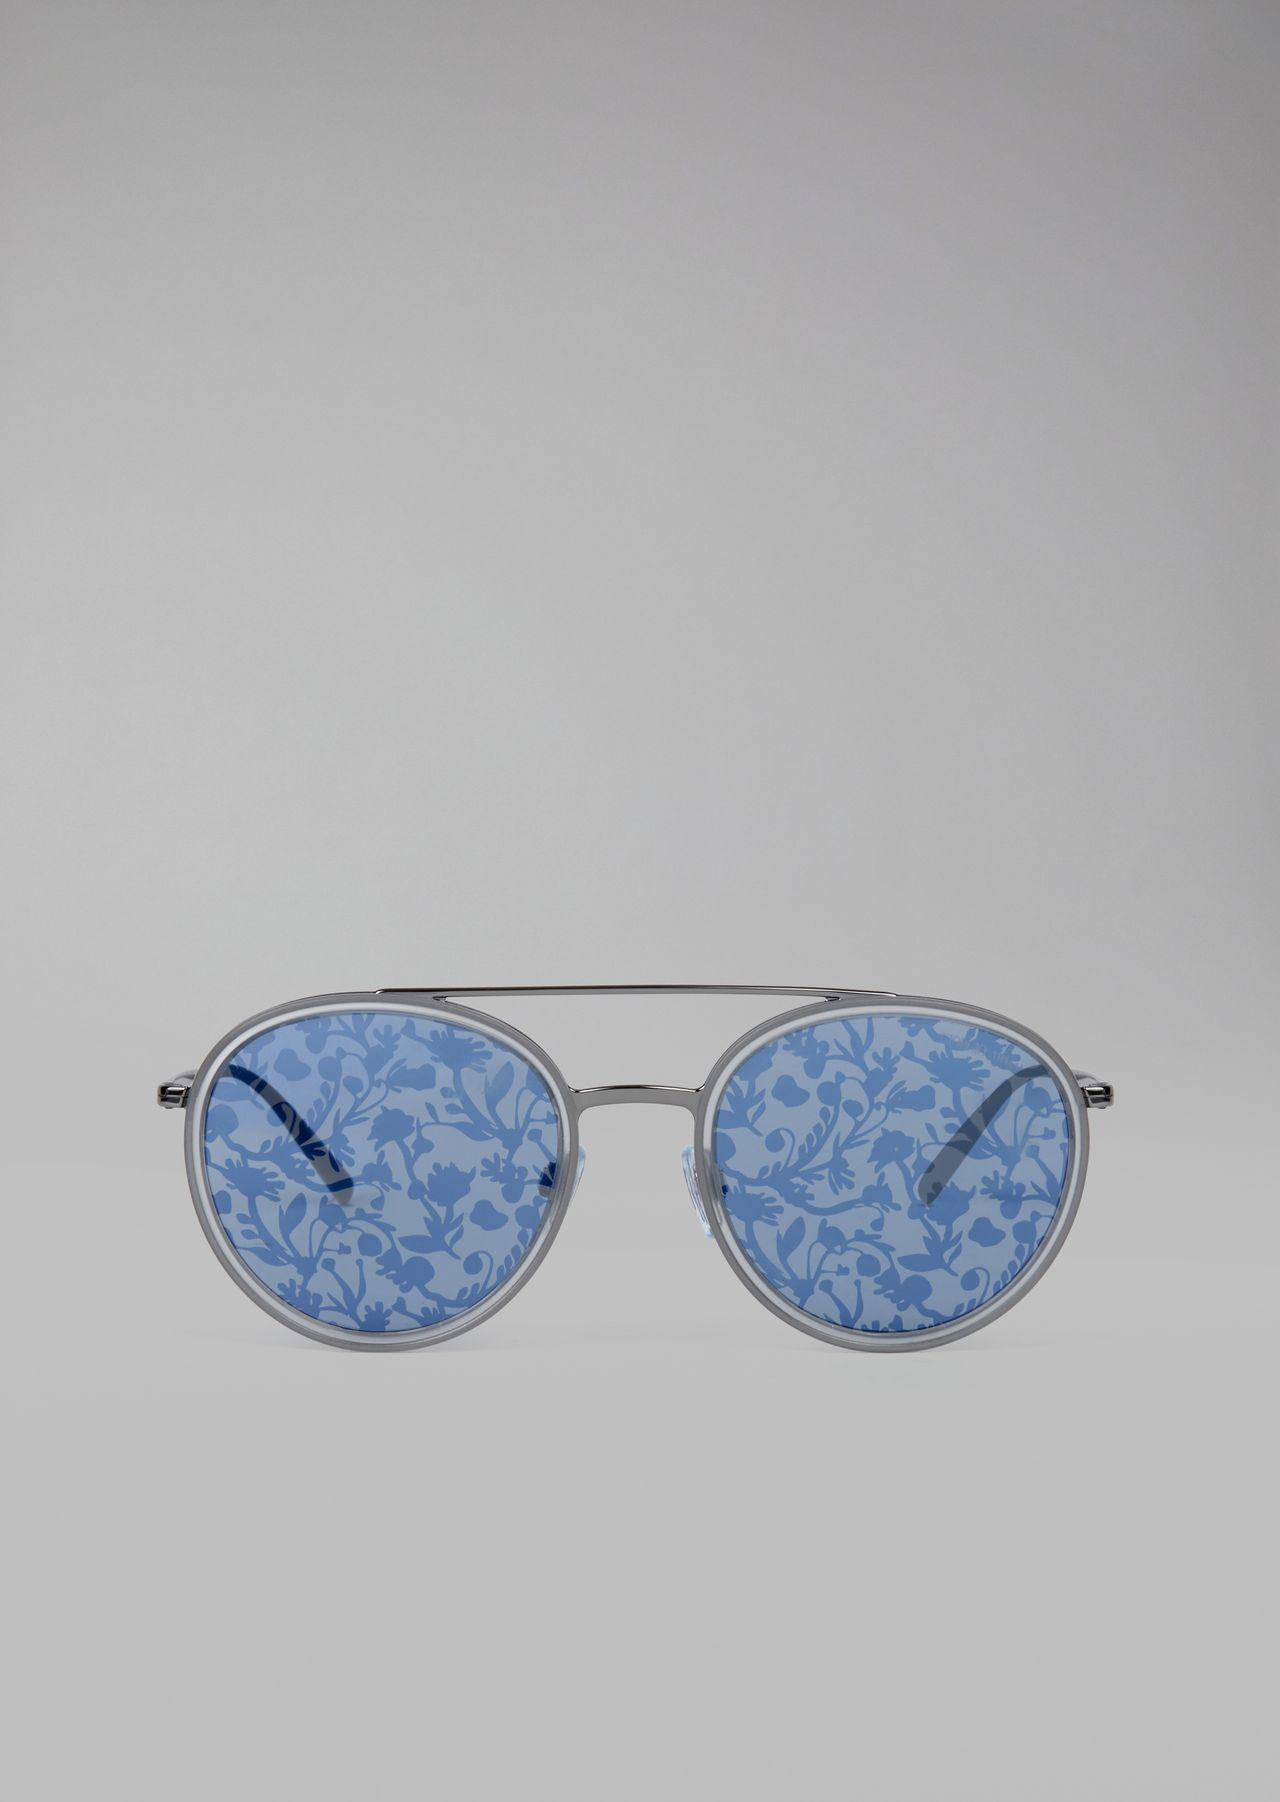 5e1ffa82493 GIORGIO ARMANI Sunglasses. GIORGIO ARMANI Sunglasses Armani Women ...